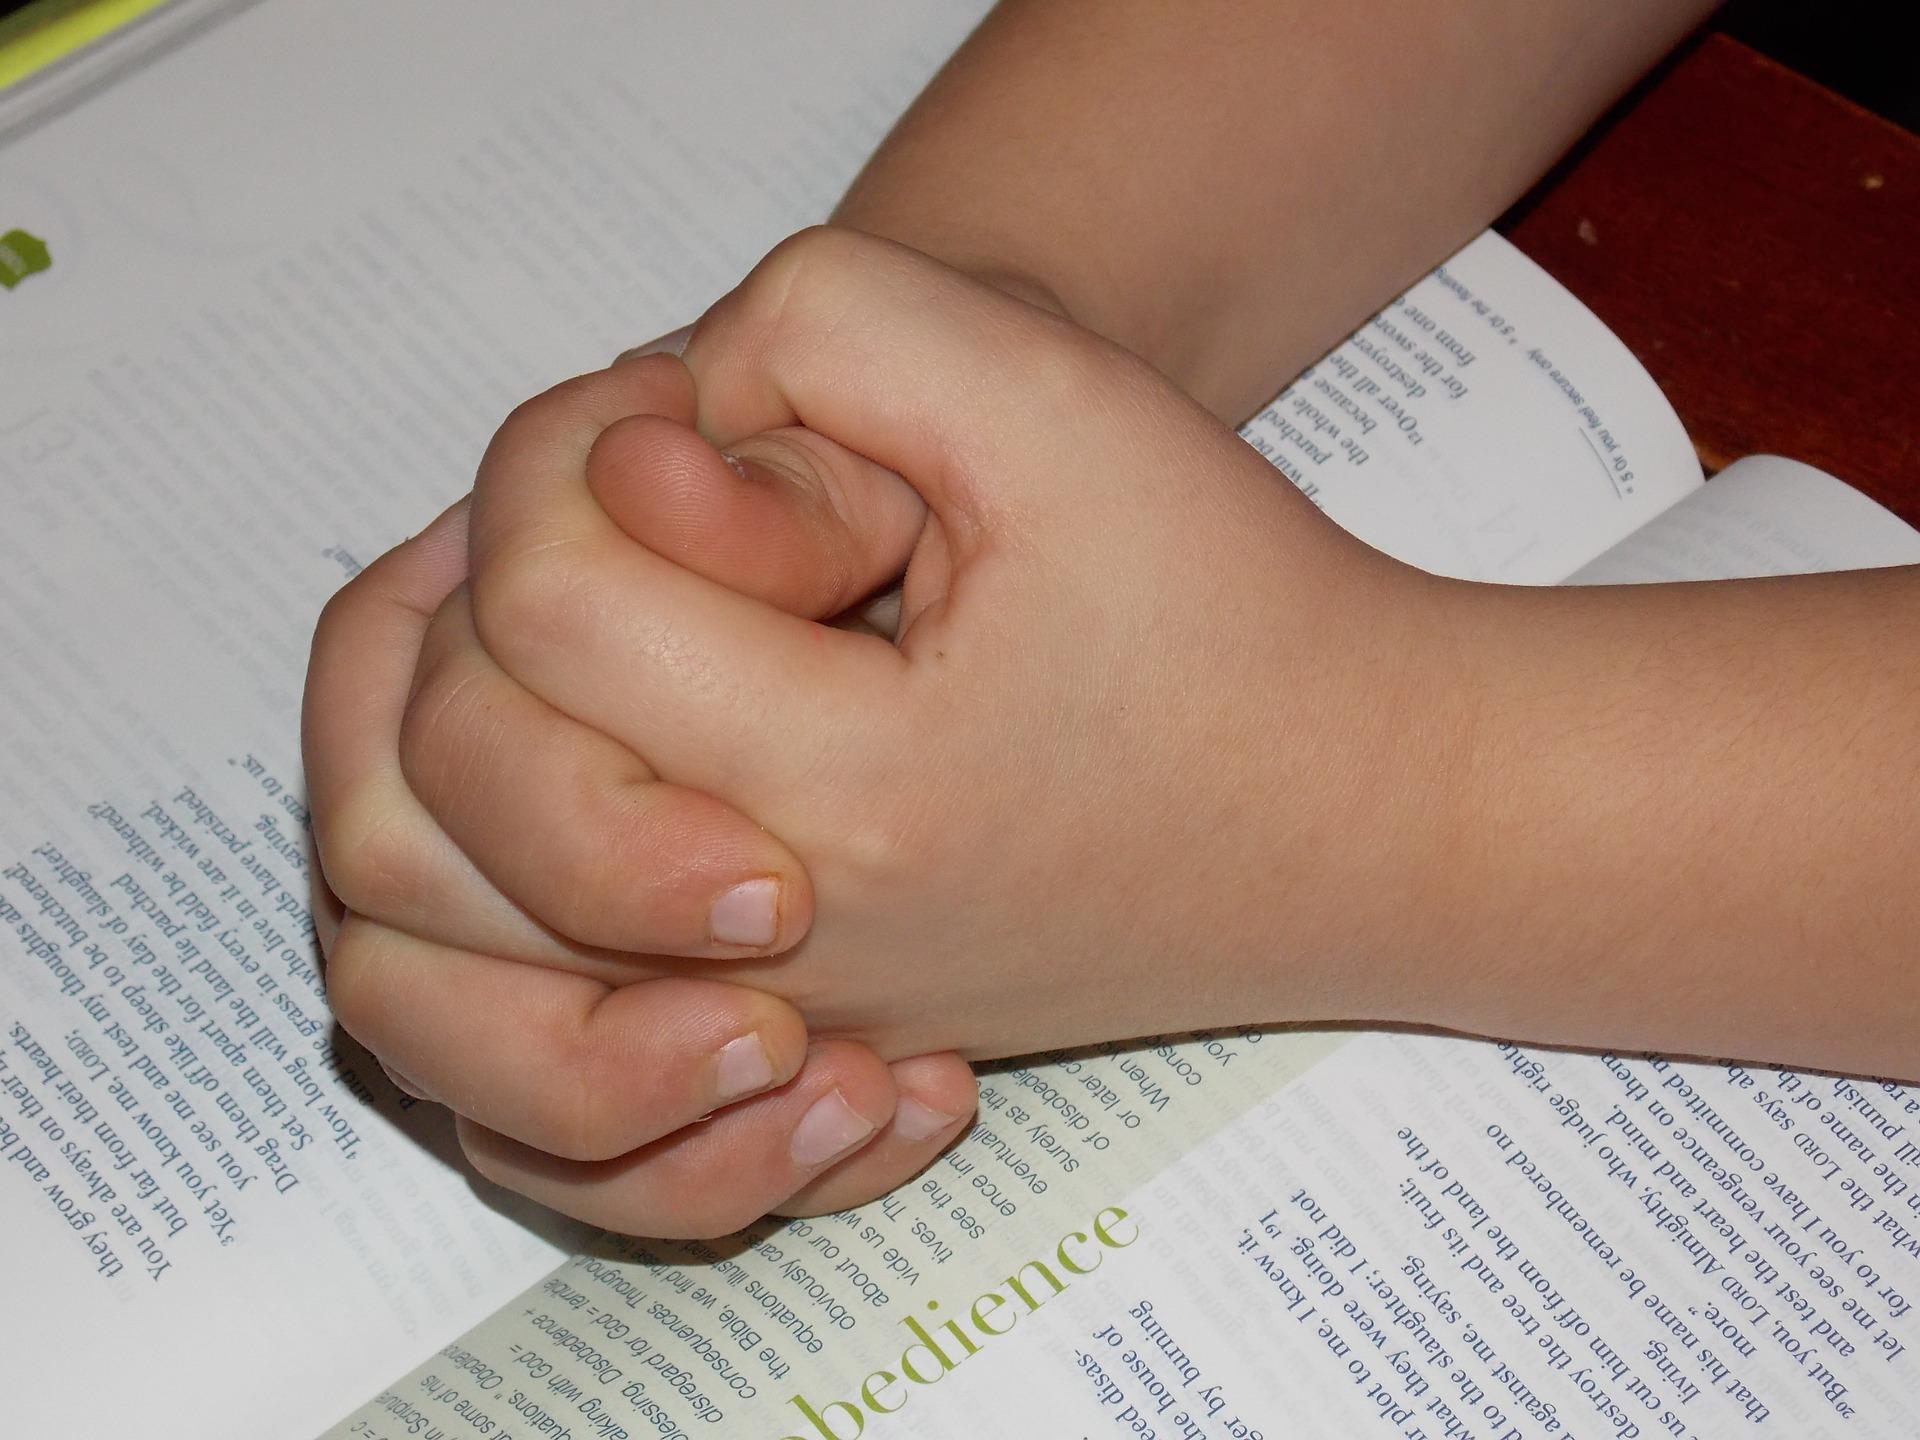 child-praying-hands-1510773_1920.jpg